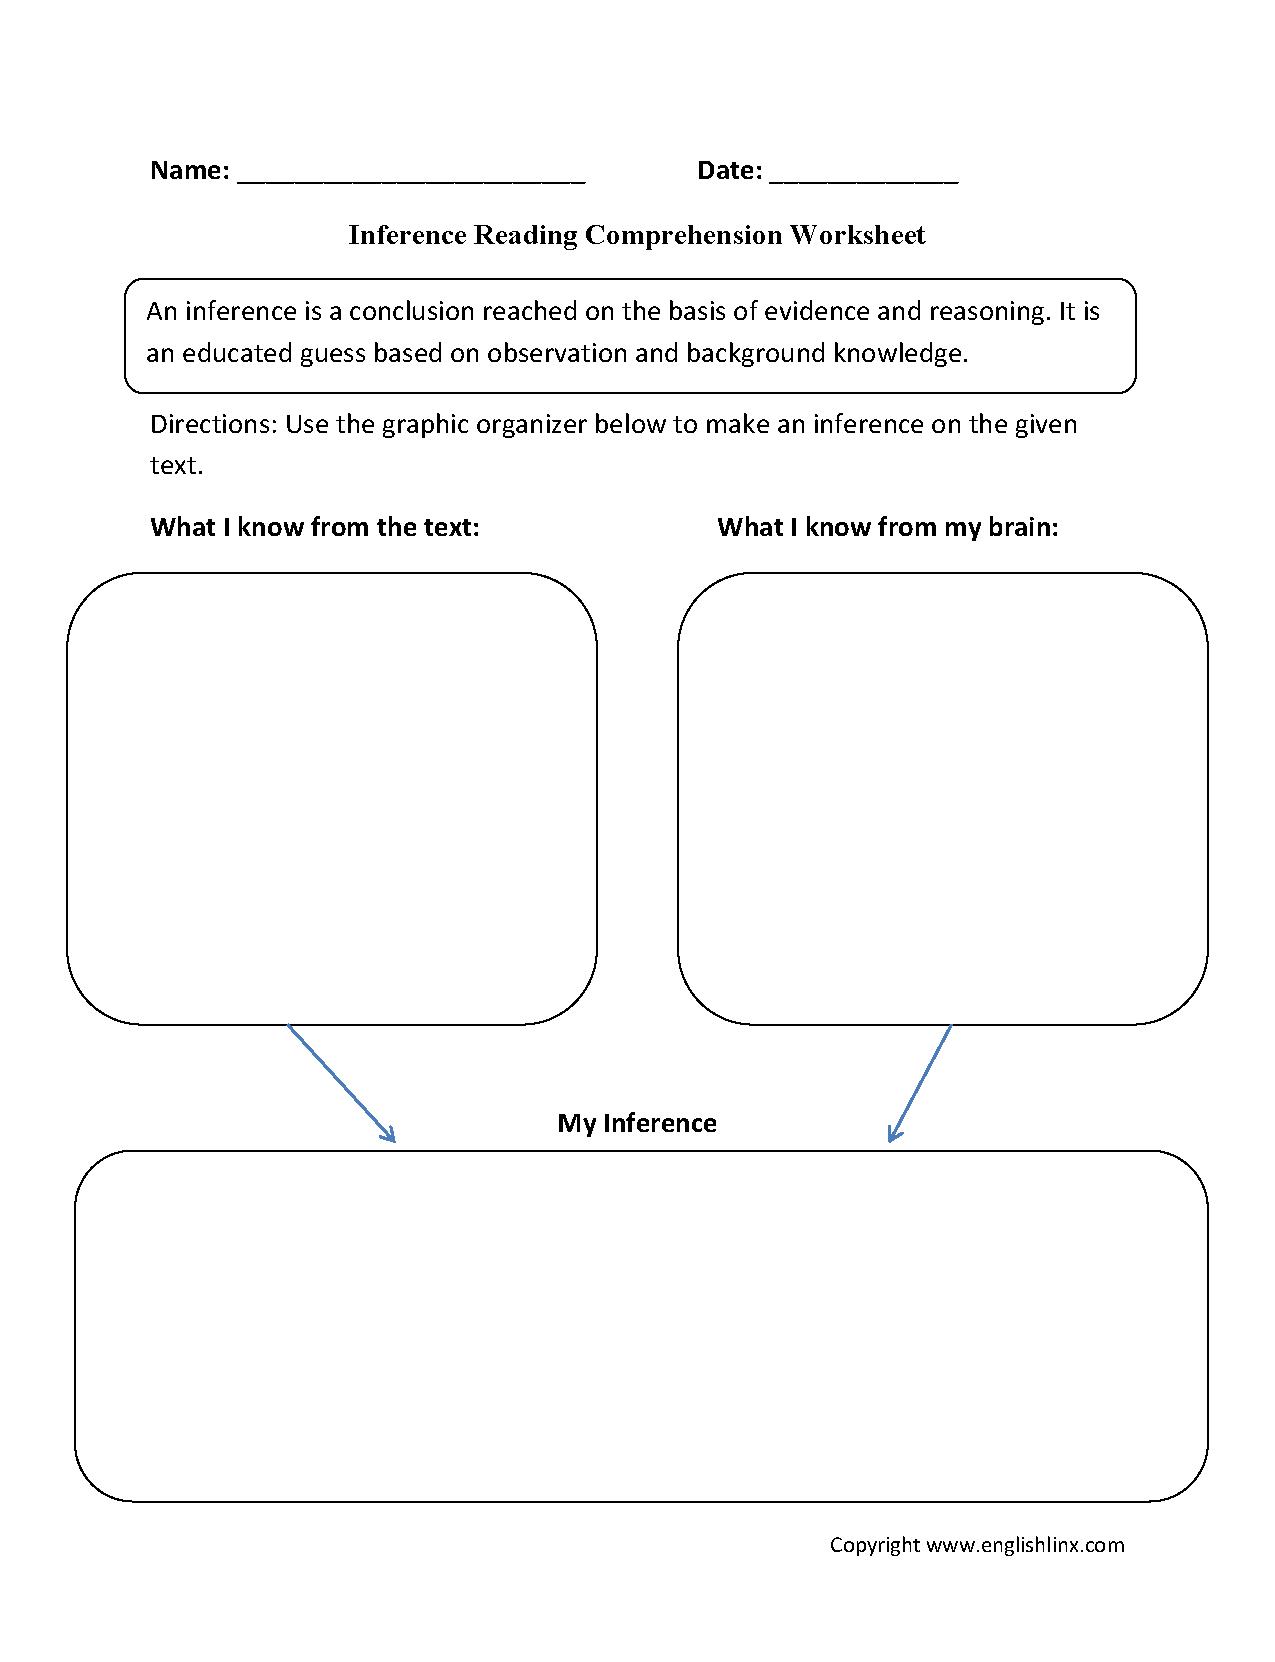 Englishlinx | Reading Comprehension Worksheets - Free Printable Worksheets Reading Comprehension 5Th Grade